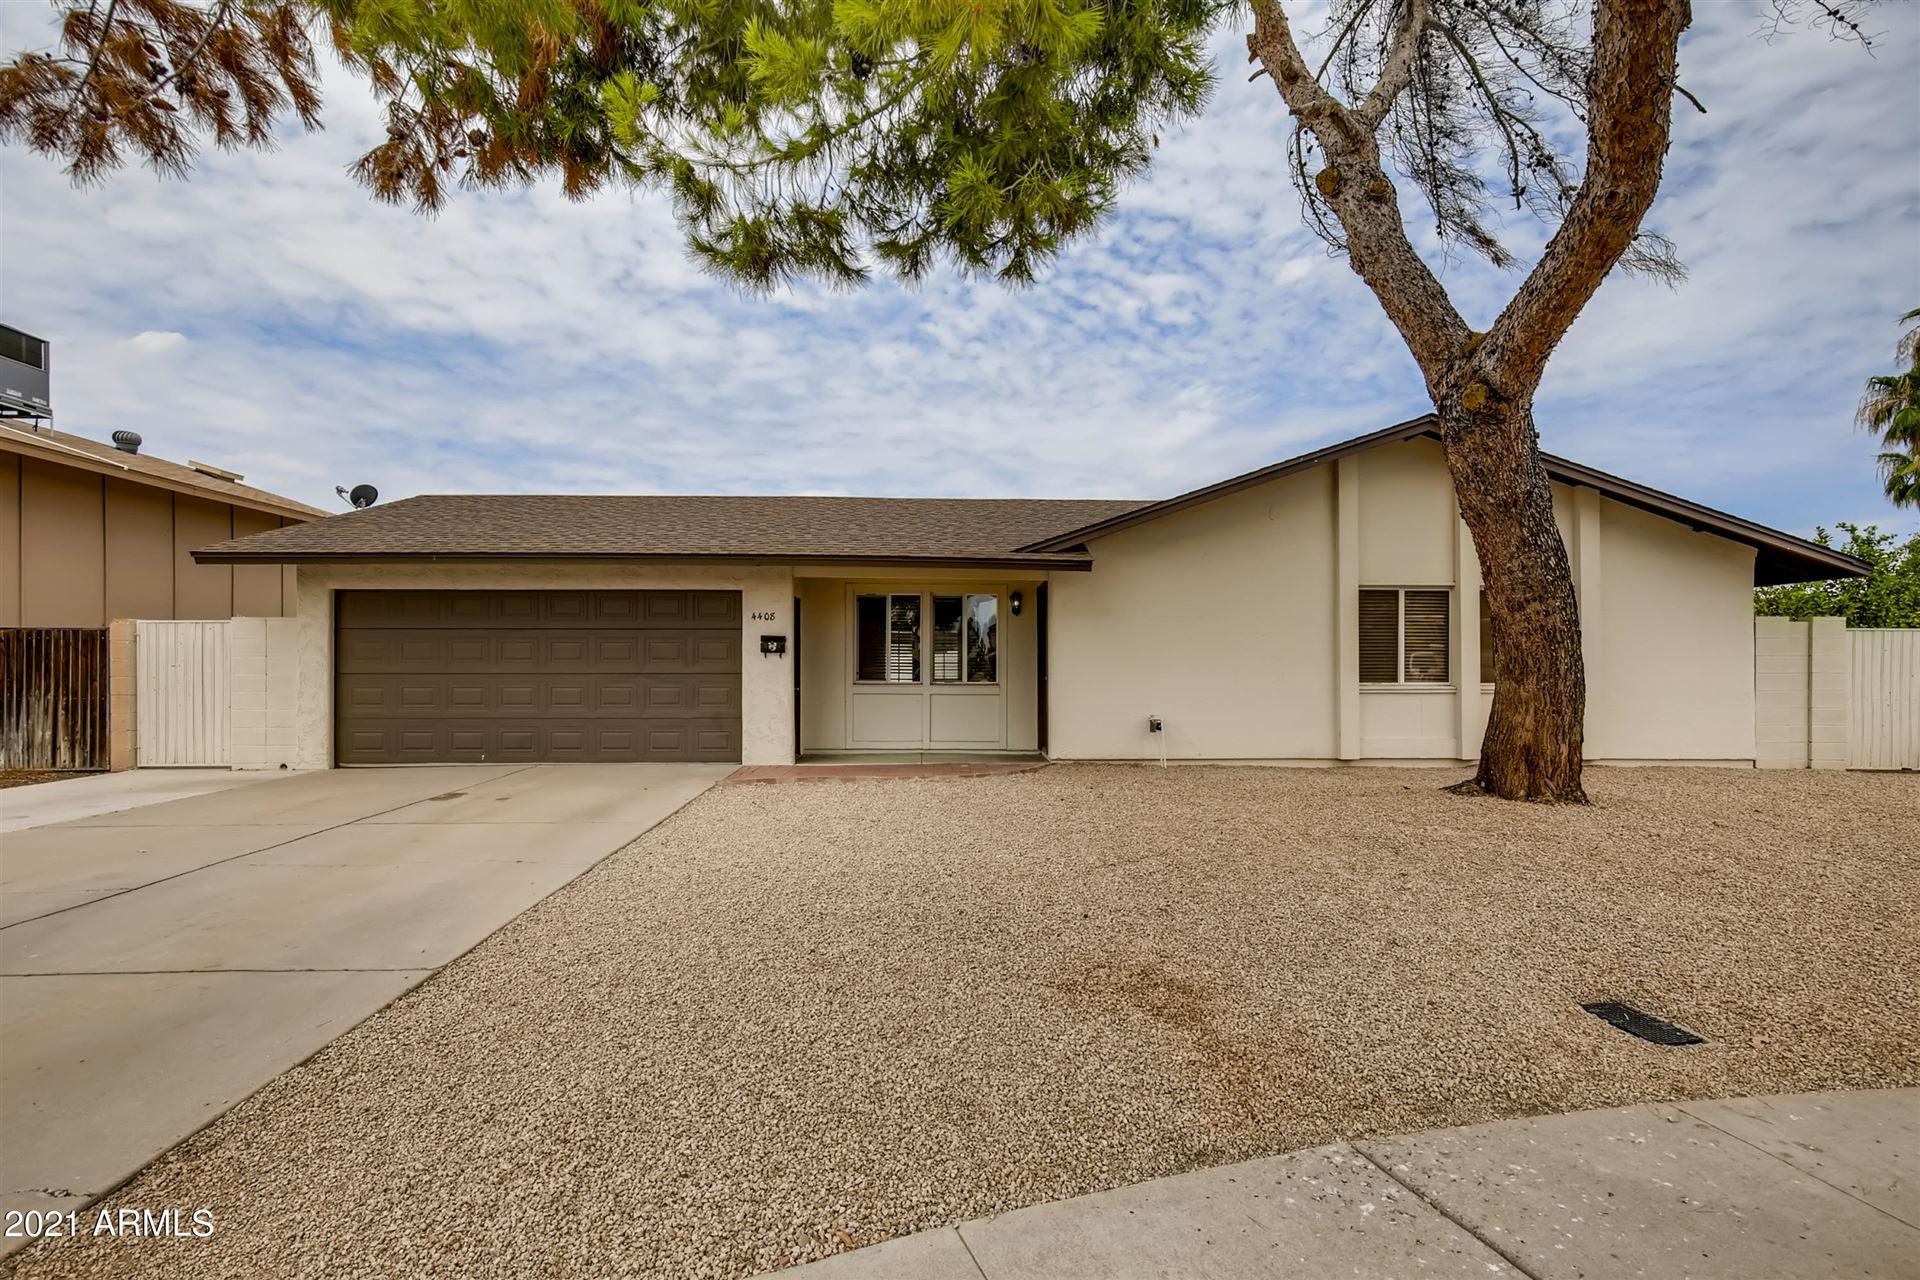 4408 S NEWBERRY Road, Tempe, AZ 85282 - MLS#: 6259262